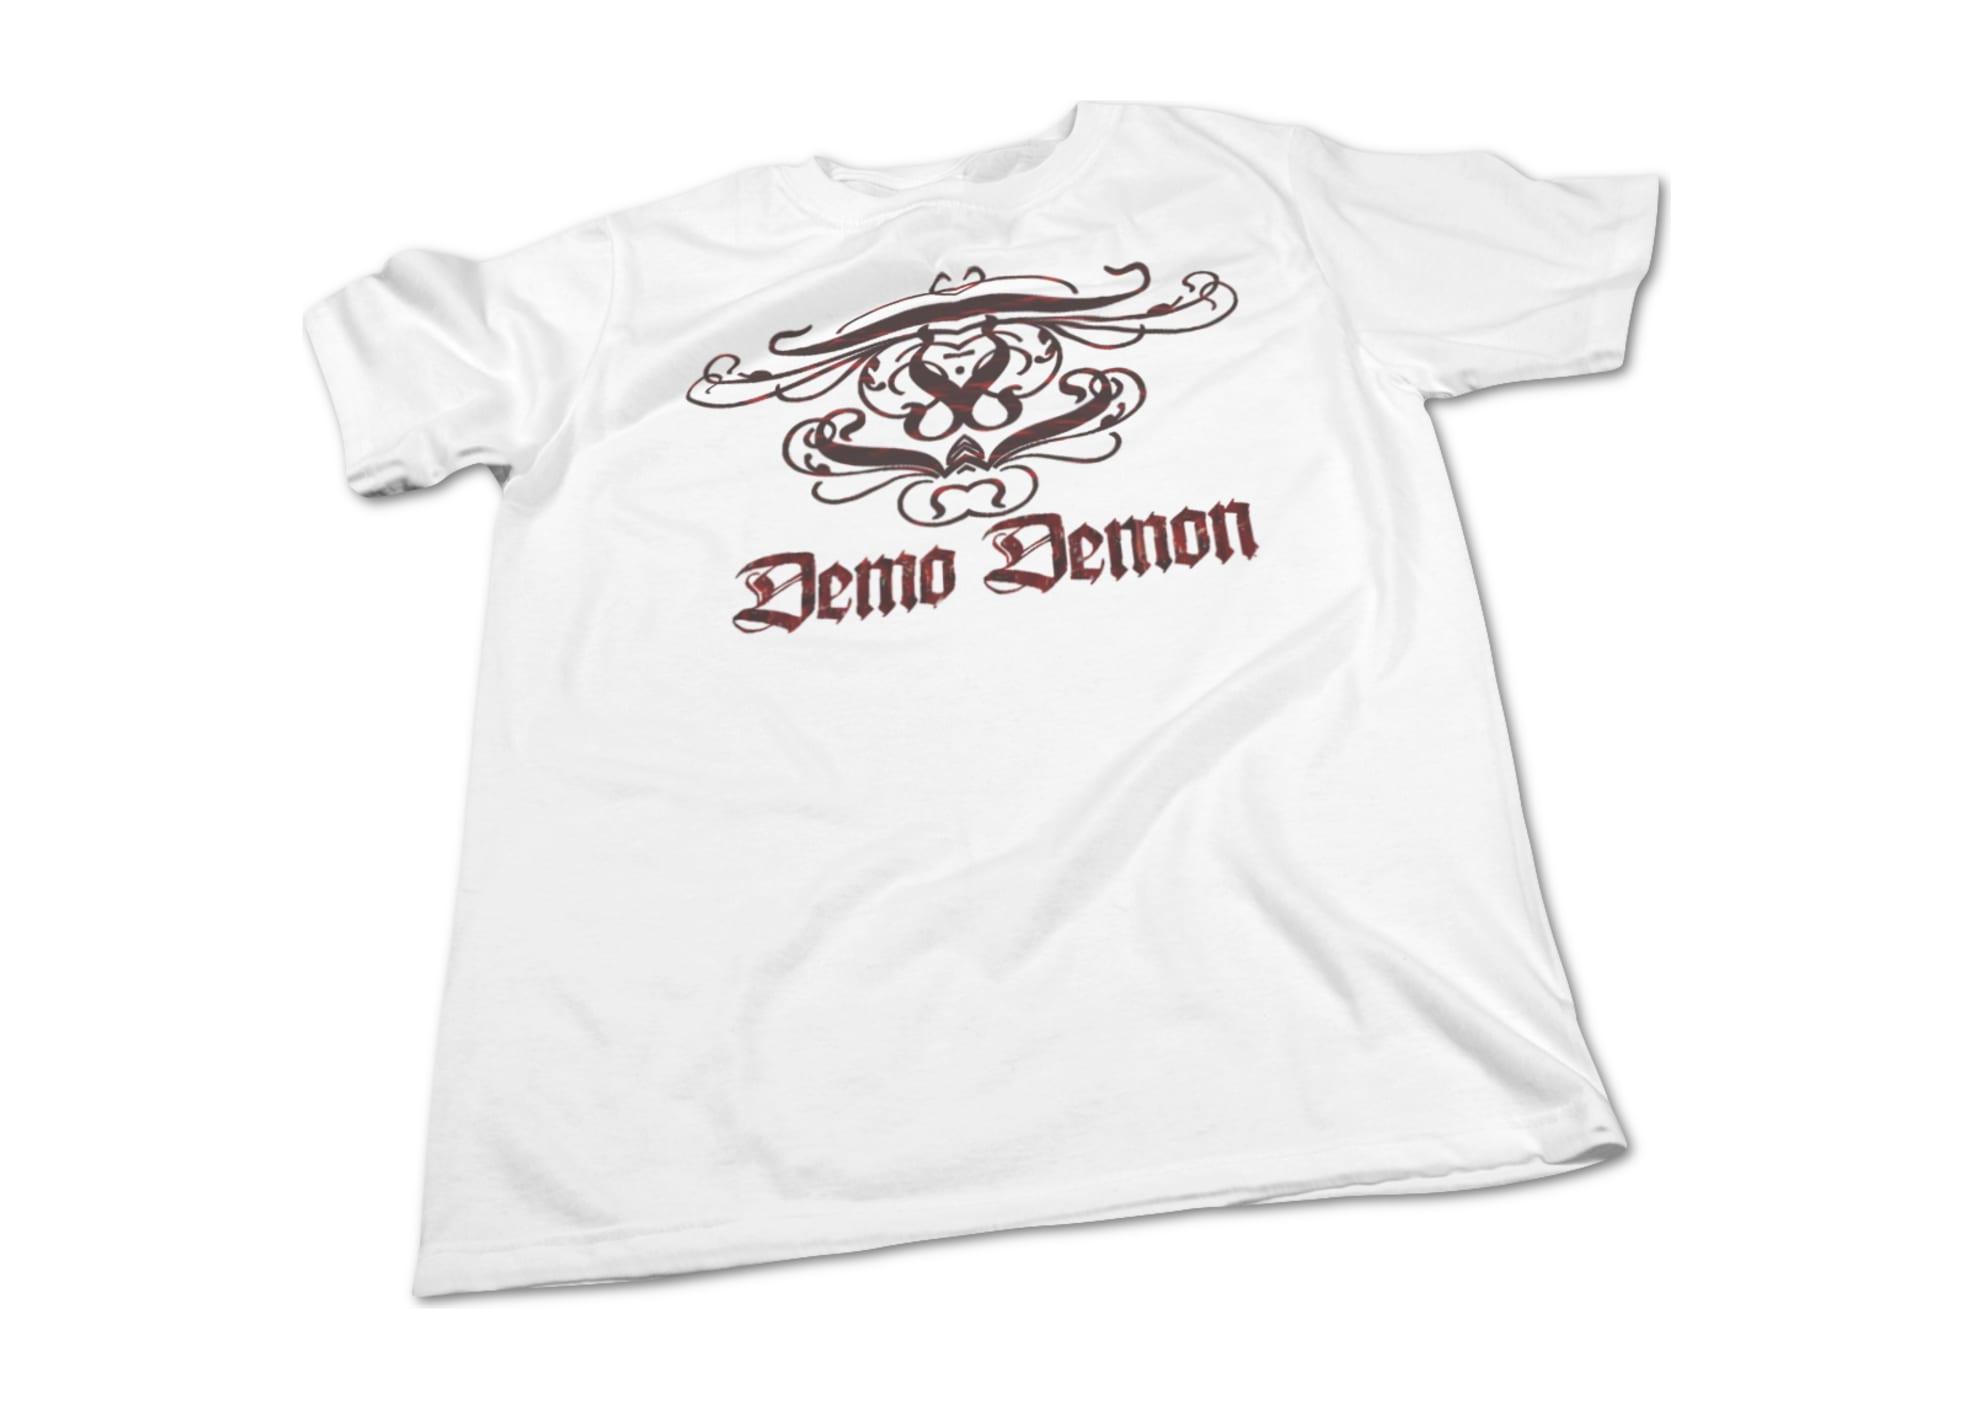 Demo demon infect 2 blood shirt 1509088056